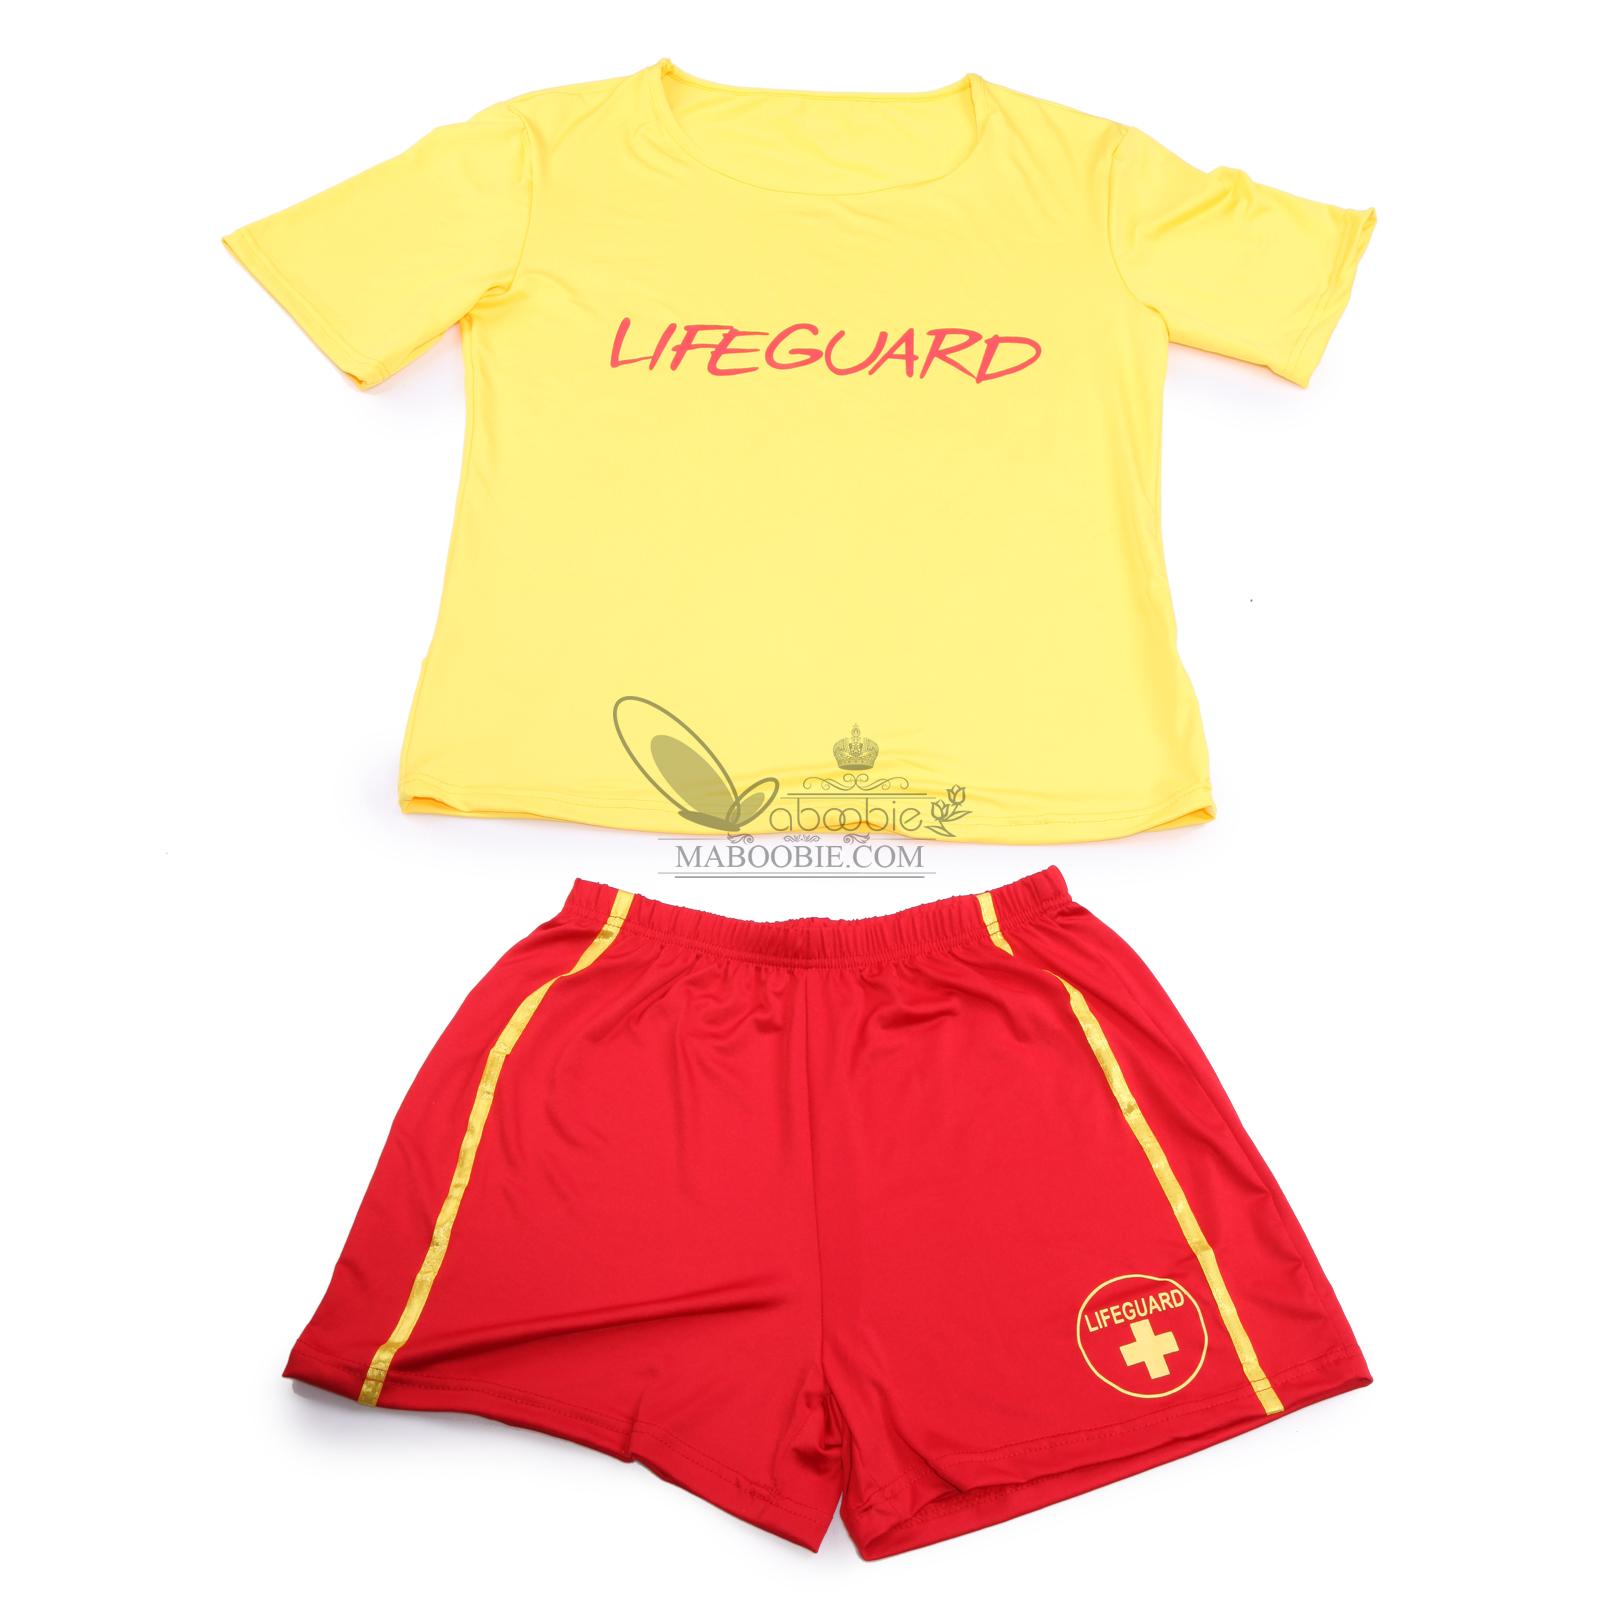 baywatch lifeguard damen kost m shorts t shirt sport lebensretter damenkost m ebay. Black Bedroom Furniture Sets. Home Design Ideas